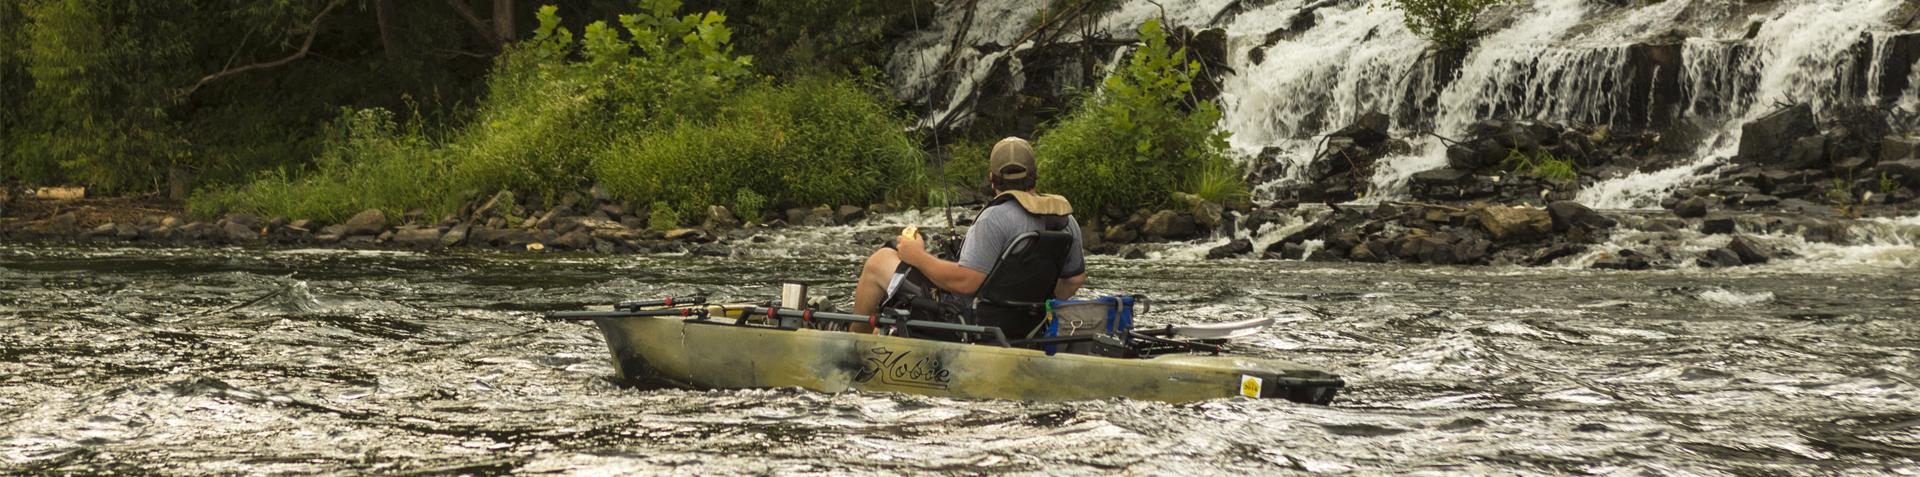 Kayaks: Mirage Pro Angler 12 by Hobie - Image 2691